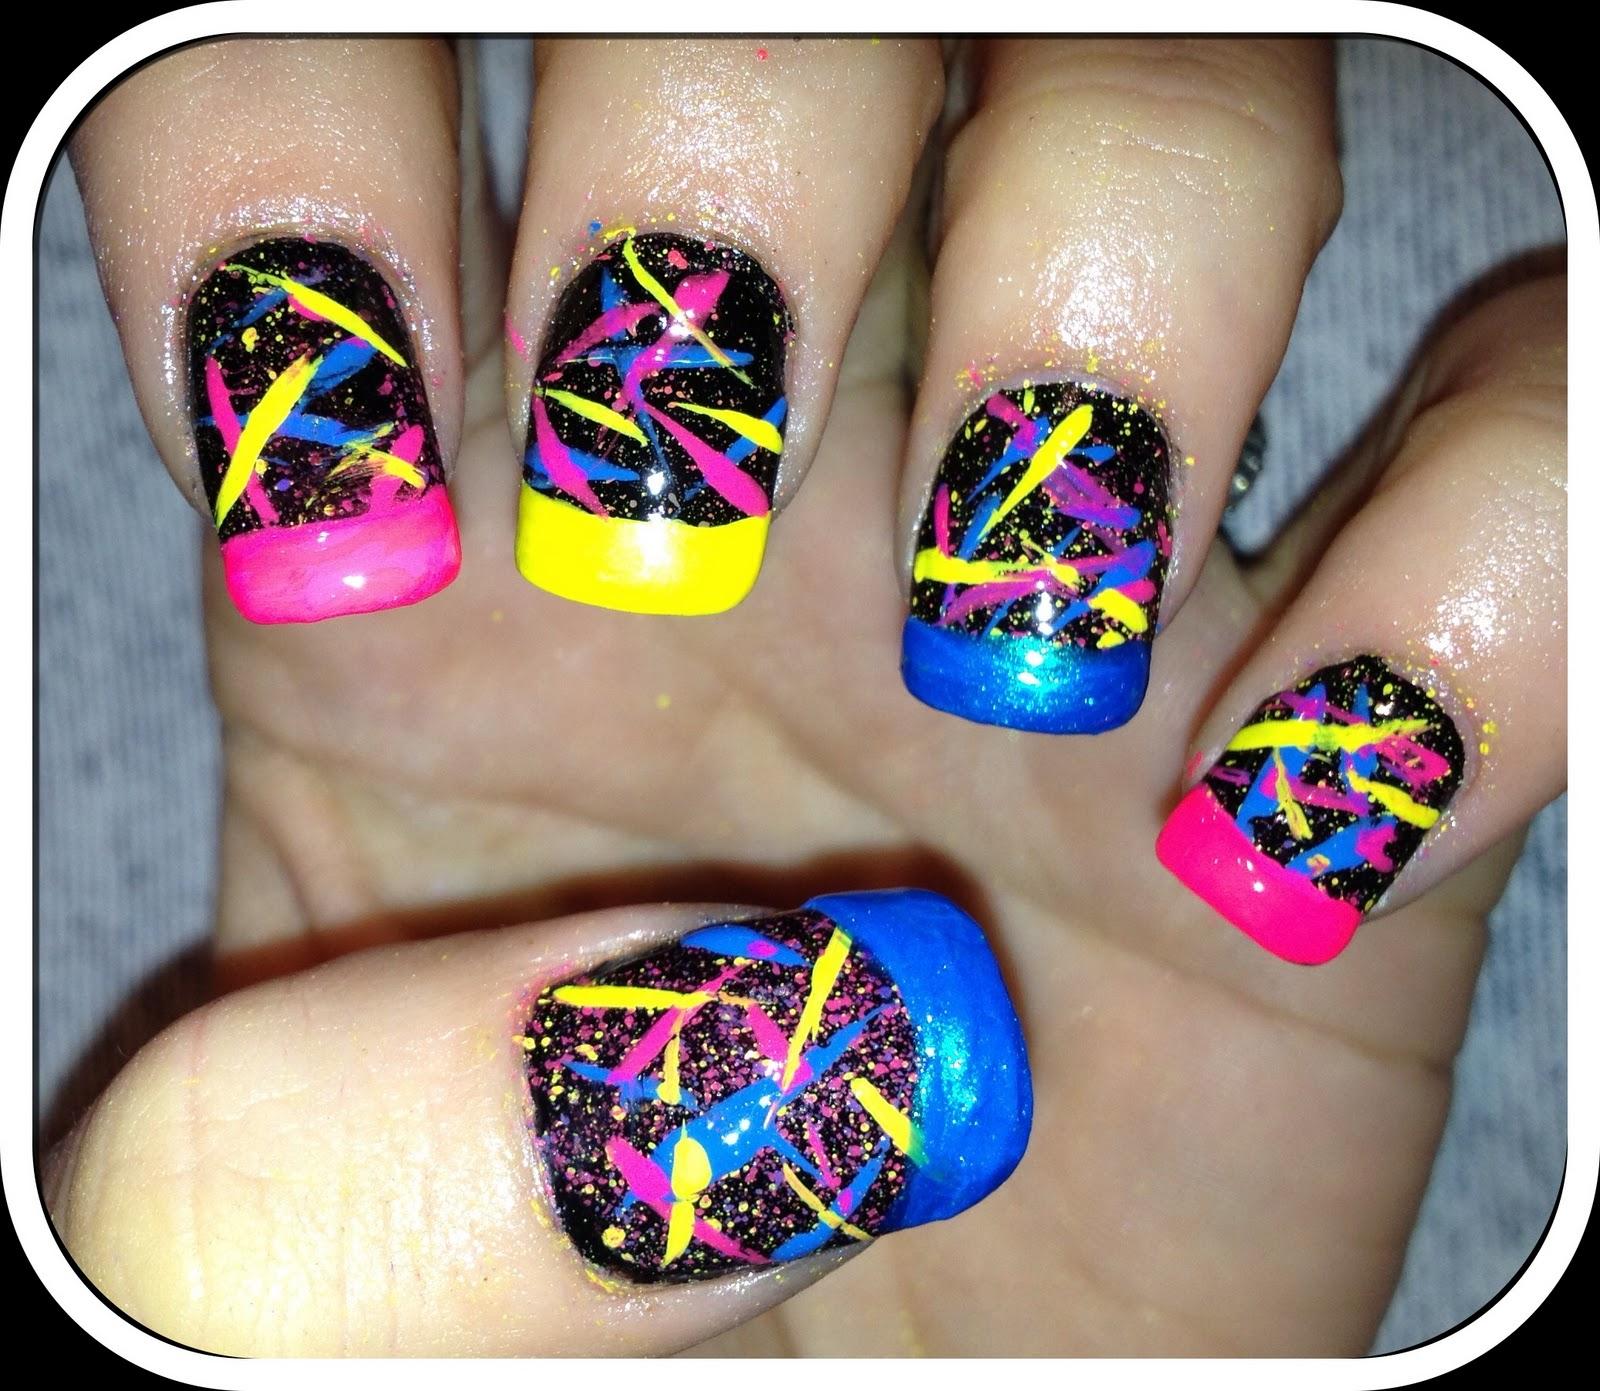 Neon Splatter Paint Nails Neon Splatter Paint Nails